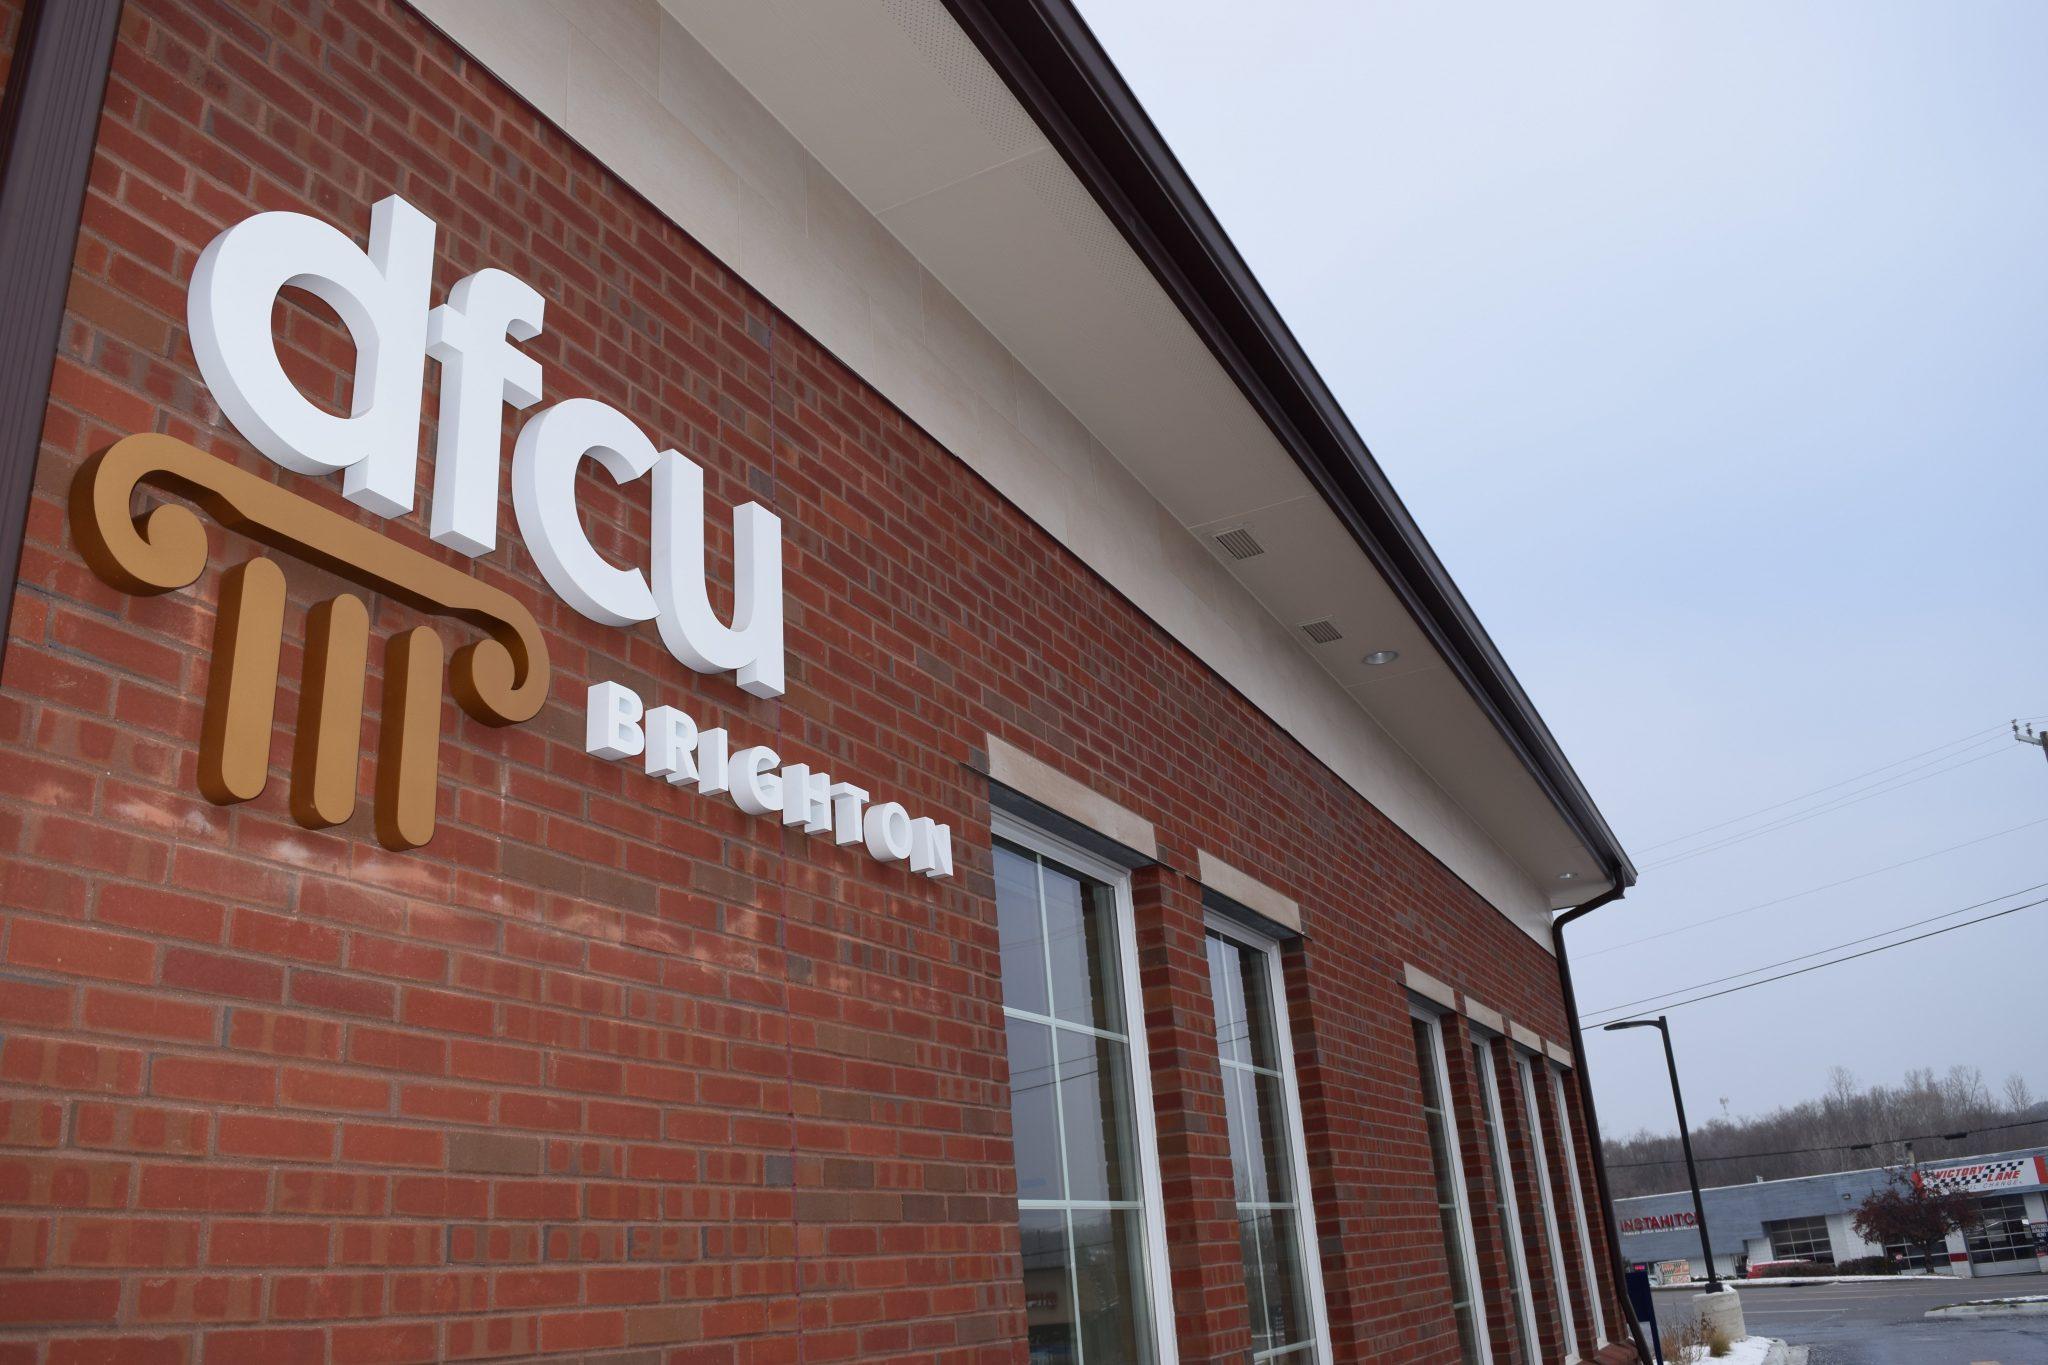 11DFCU Brighton logo on building exterior